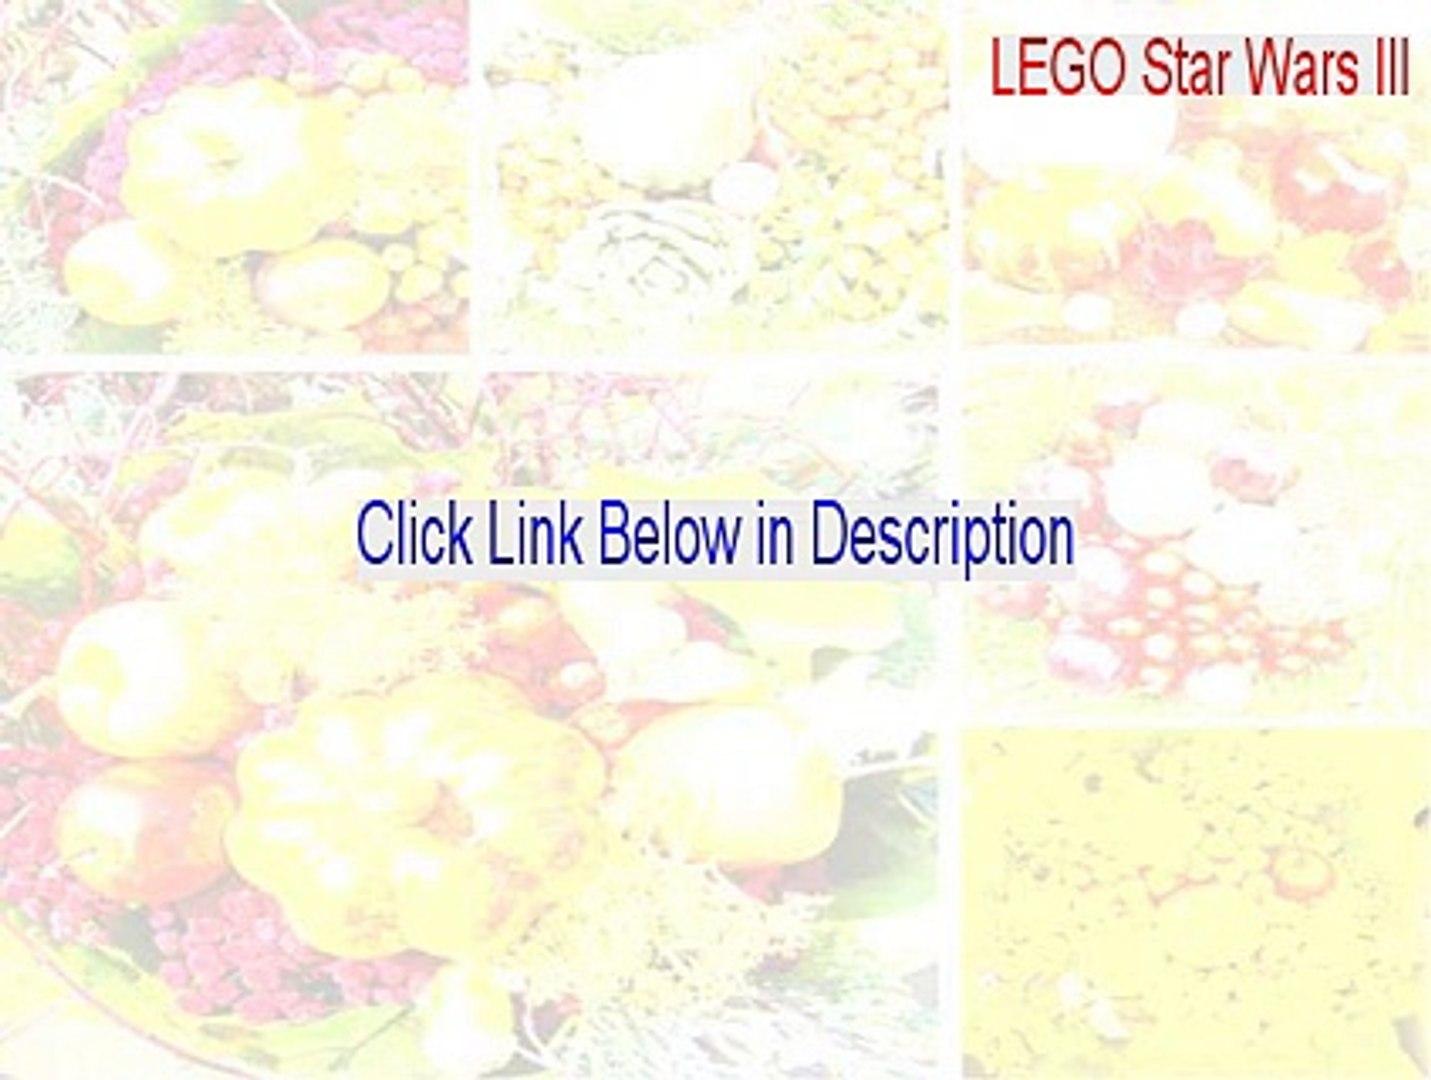 LEGO Star Wars III: The Clone Wars Key Gen (lego star wars iii review)